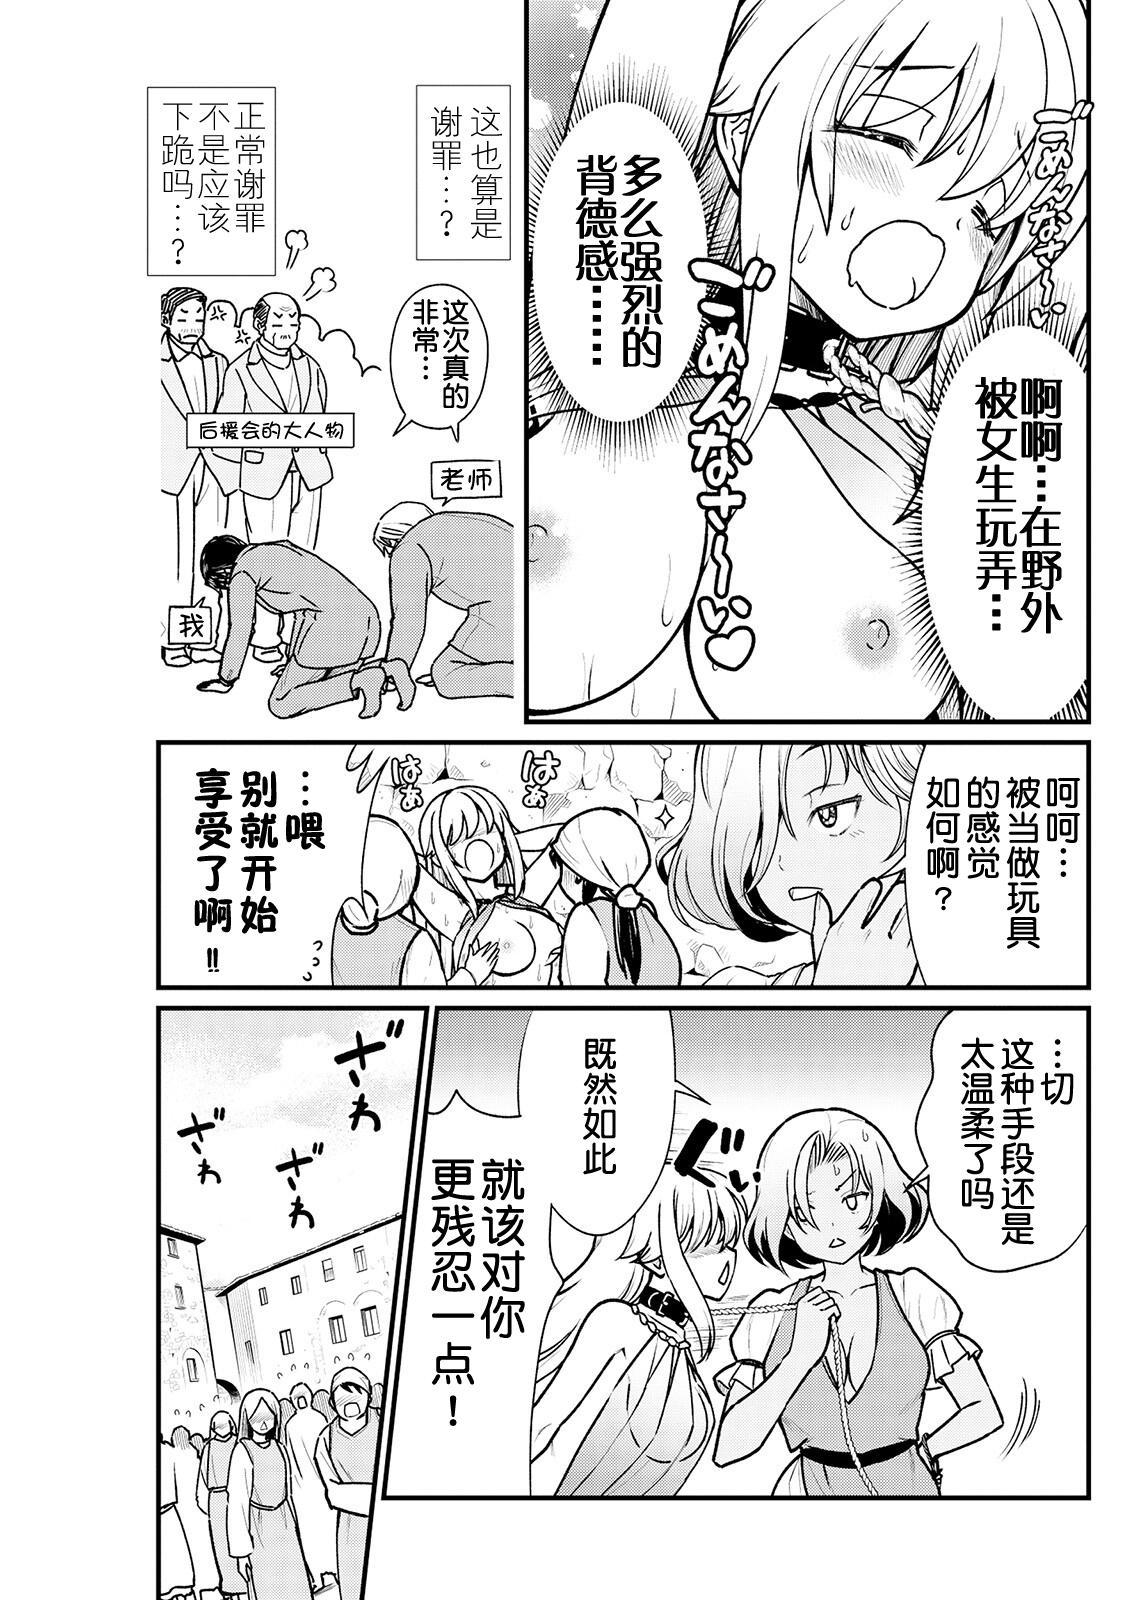 kuxtu koro se no hime kisi to nari, yuri syoukan de hatara ku koto ni nari masi ta. 3 (chinese)(鬼畜王汉化组) 9